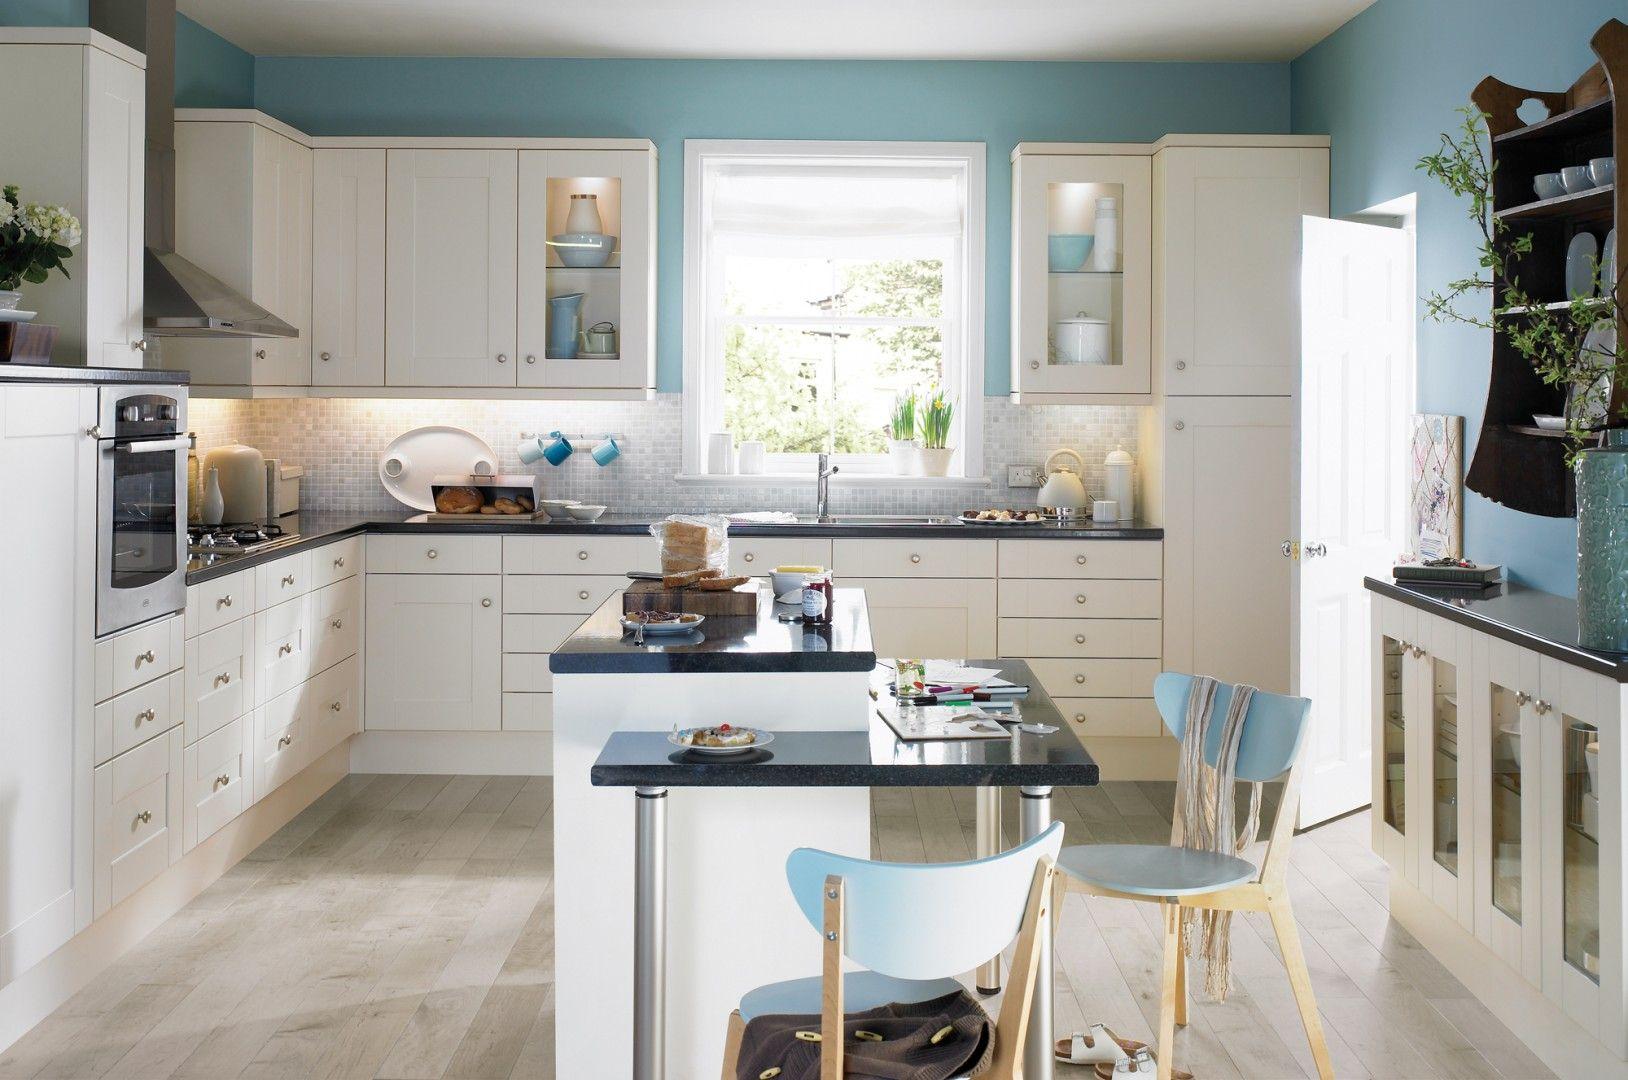 Oyster Shaker Interior by Daniel James Kitchen designs